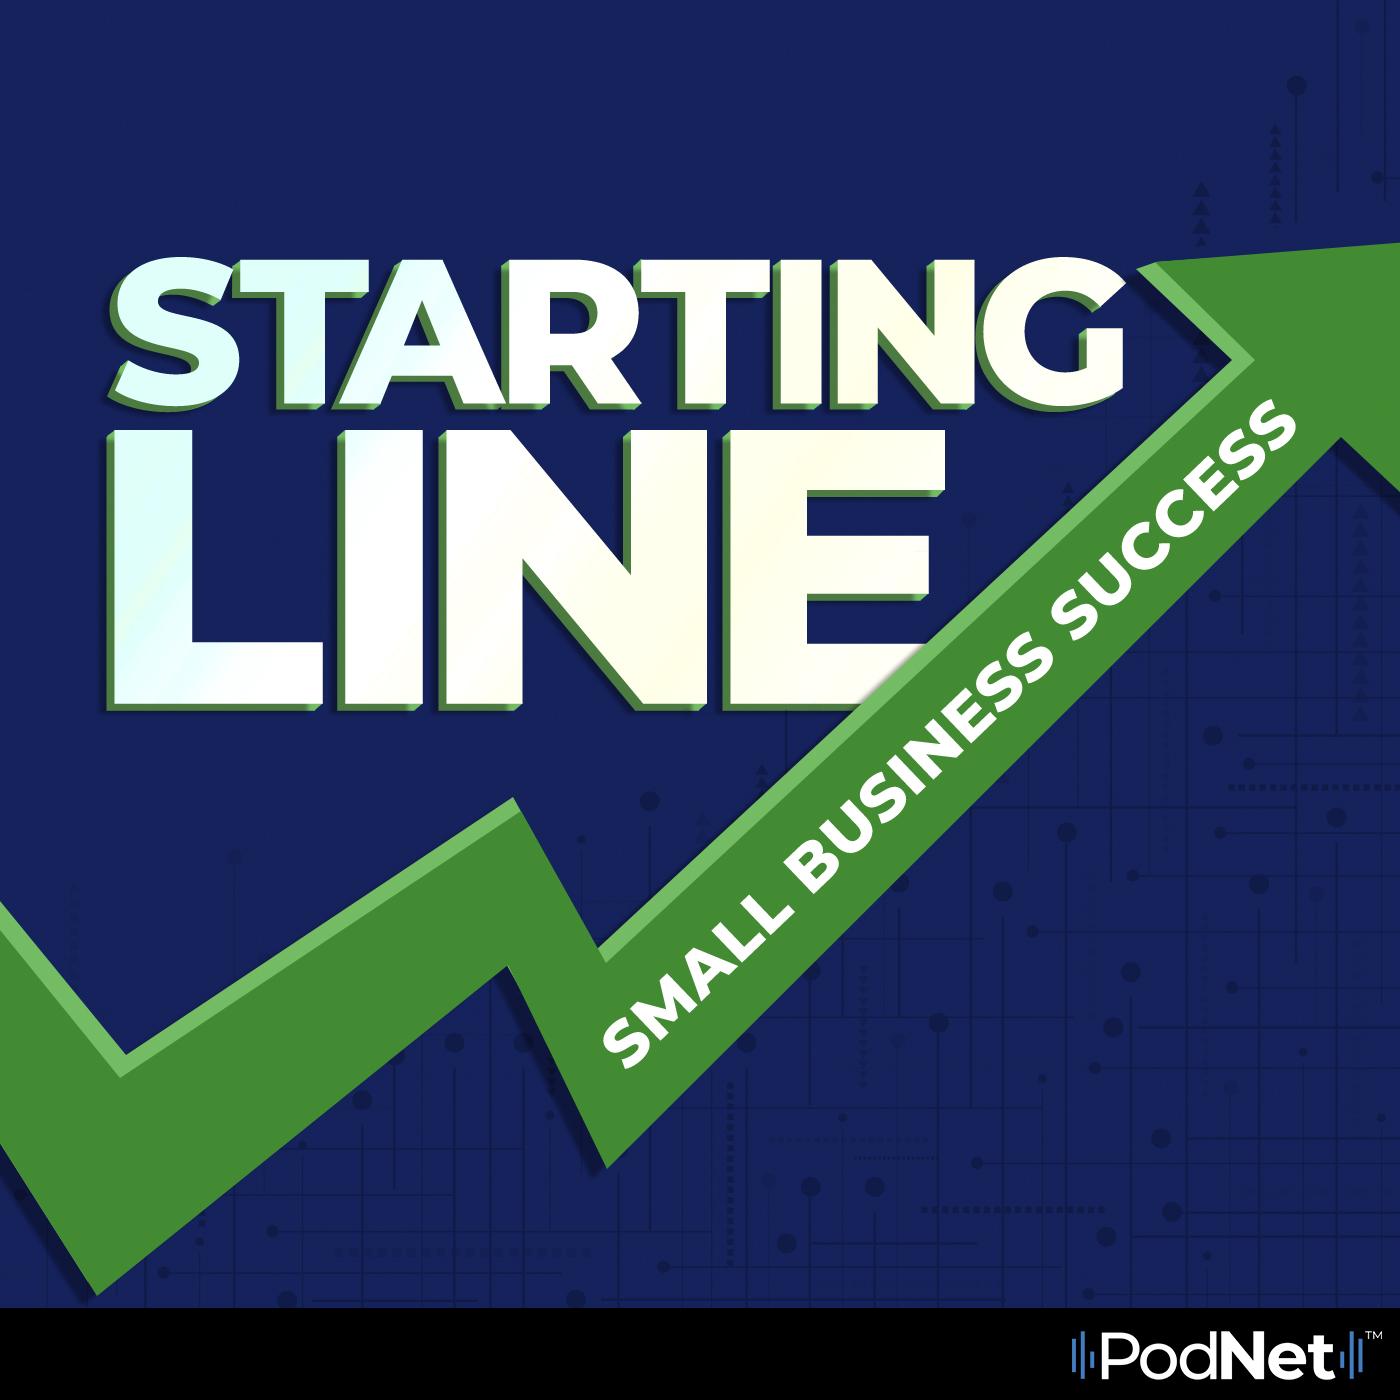 Starting Line